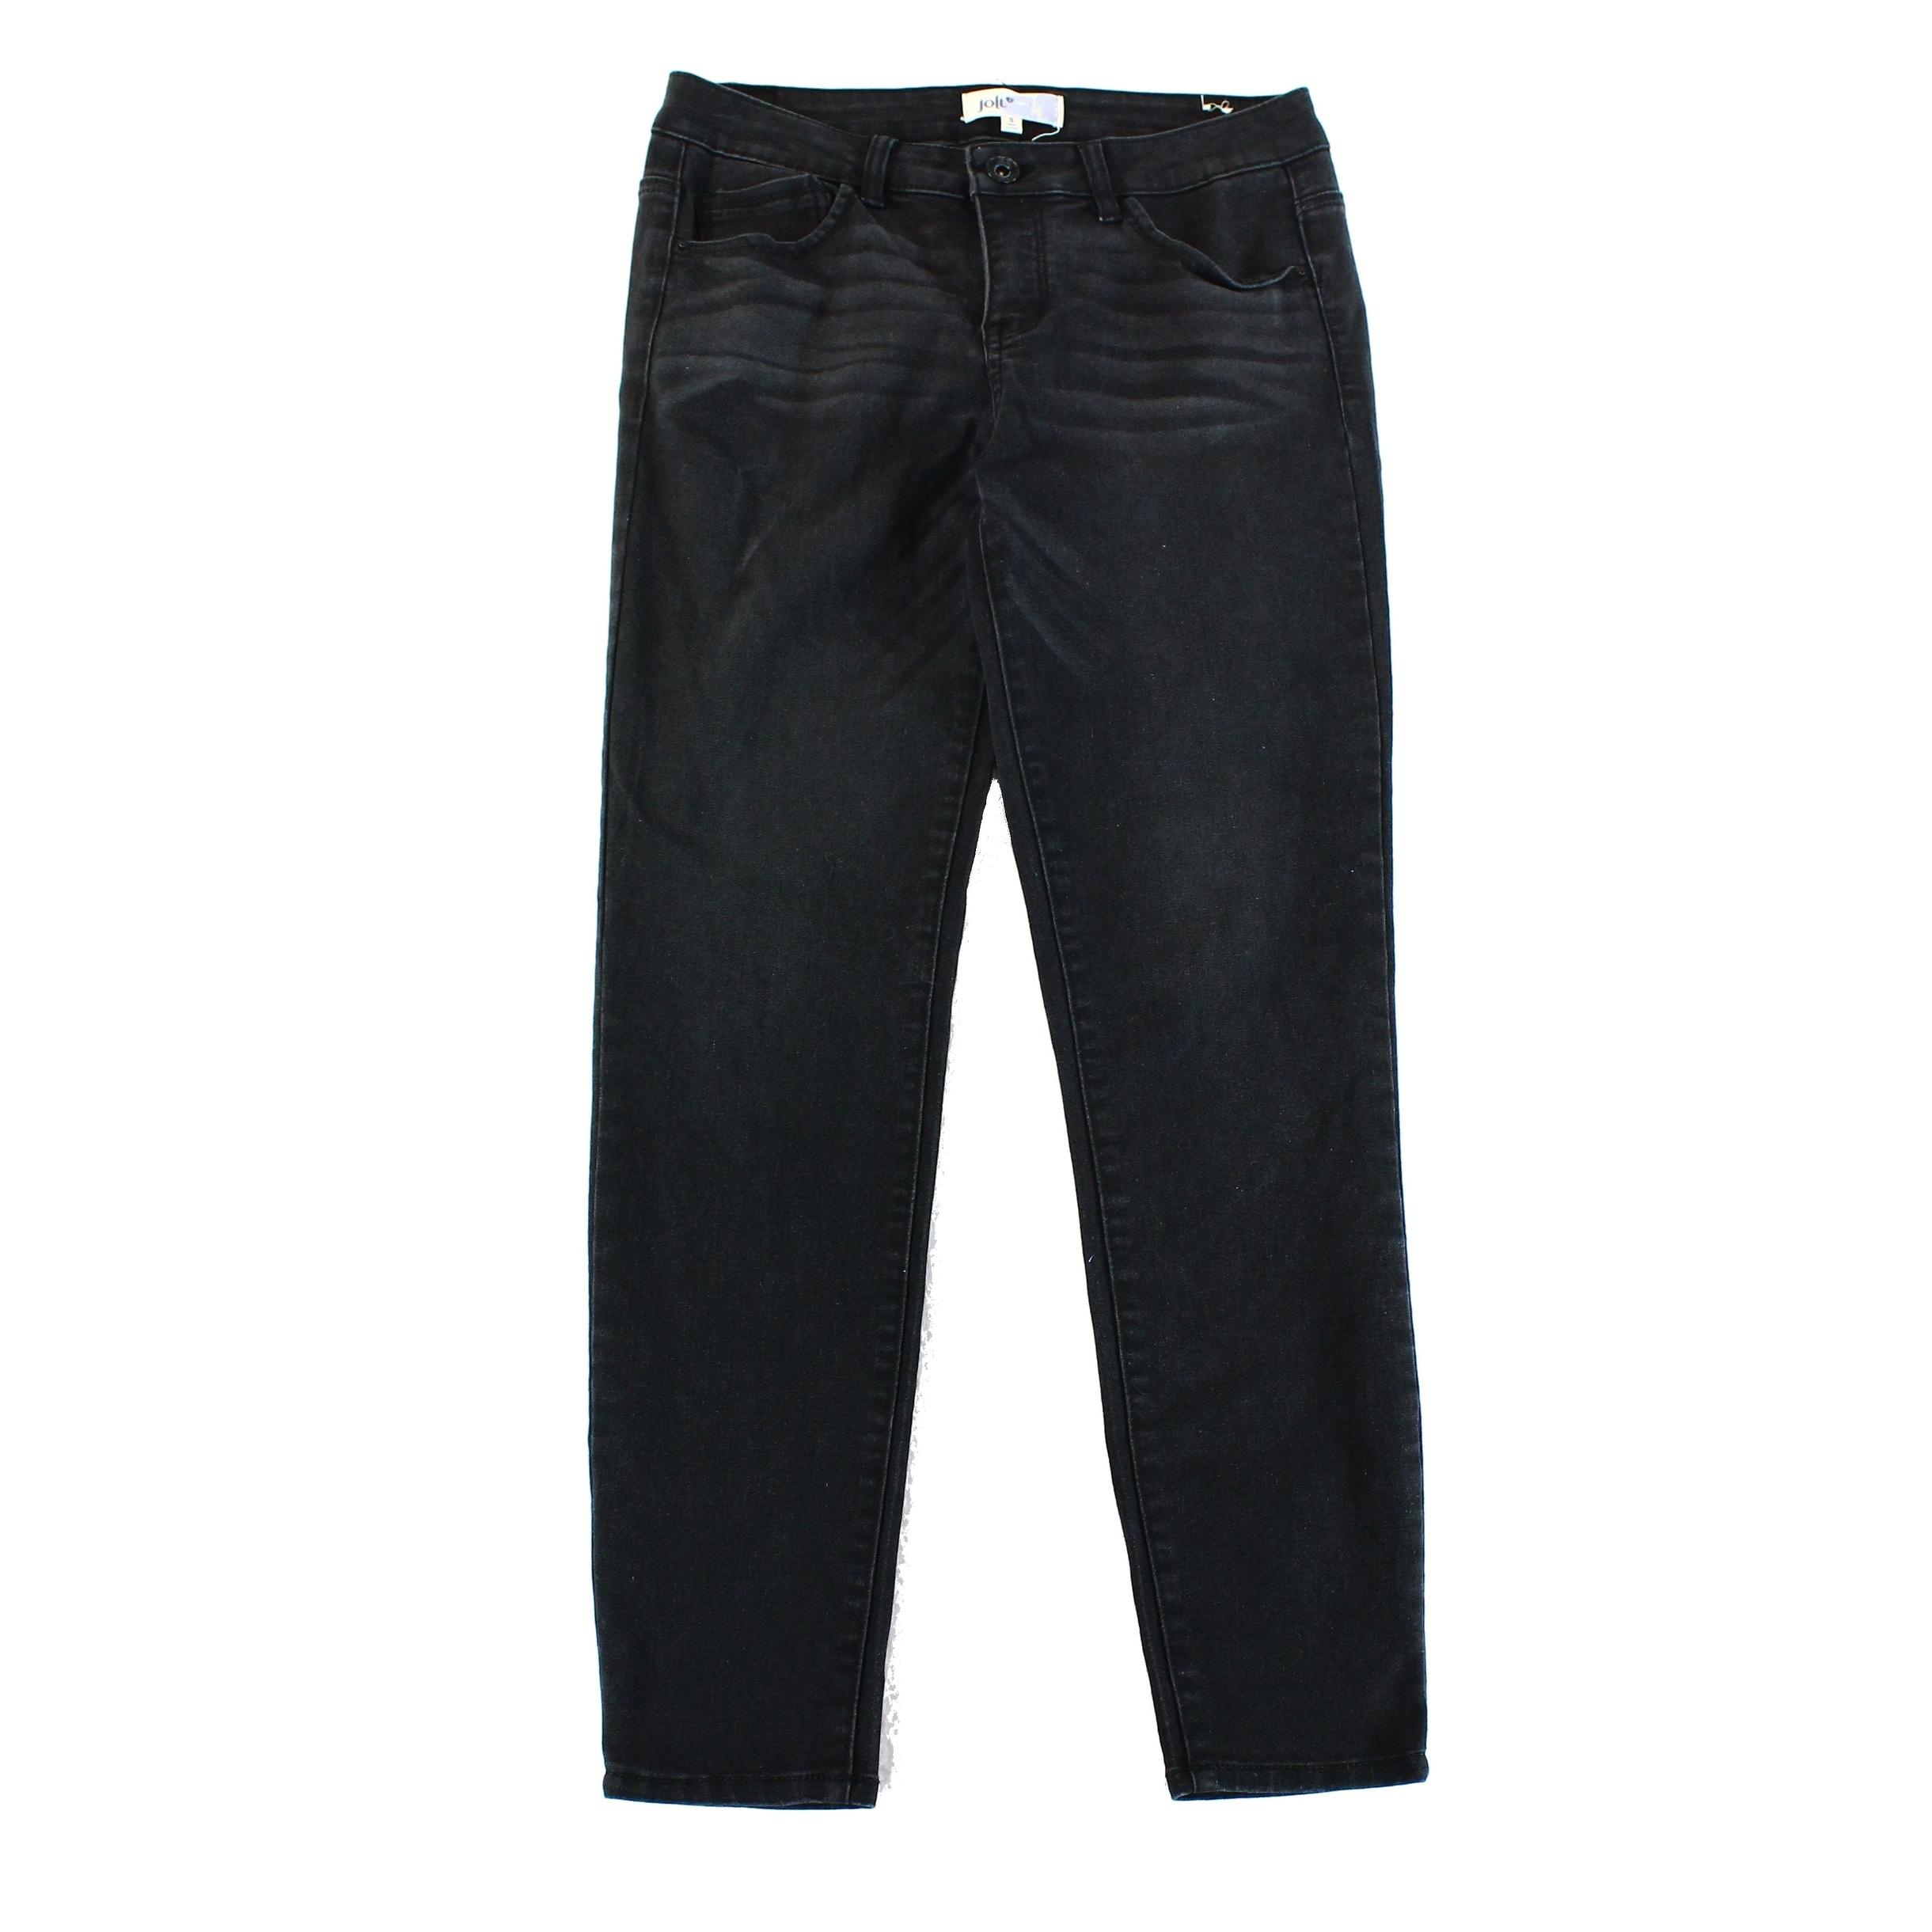 b045359ea12 Shop JOLT NEW Blue Dark Wash Denim Size 9x28 5-Pocket Junior Straight Leg -  Free Shipping On Orders Over  45 - Overstock.com - 17857643